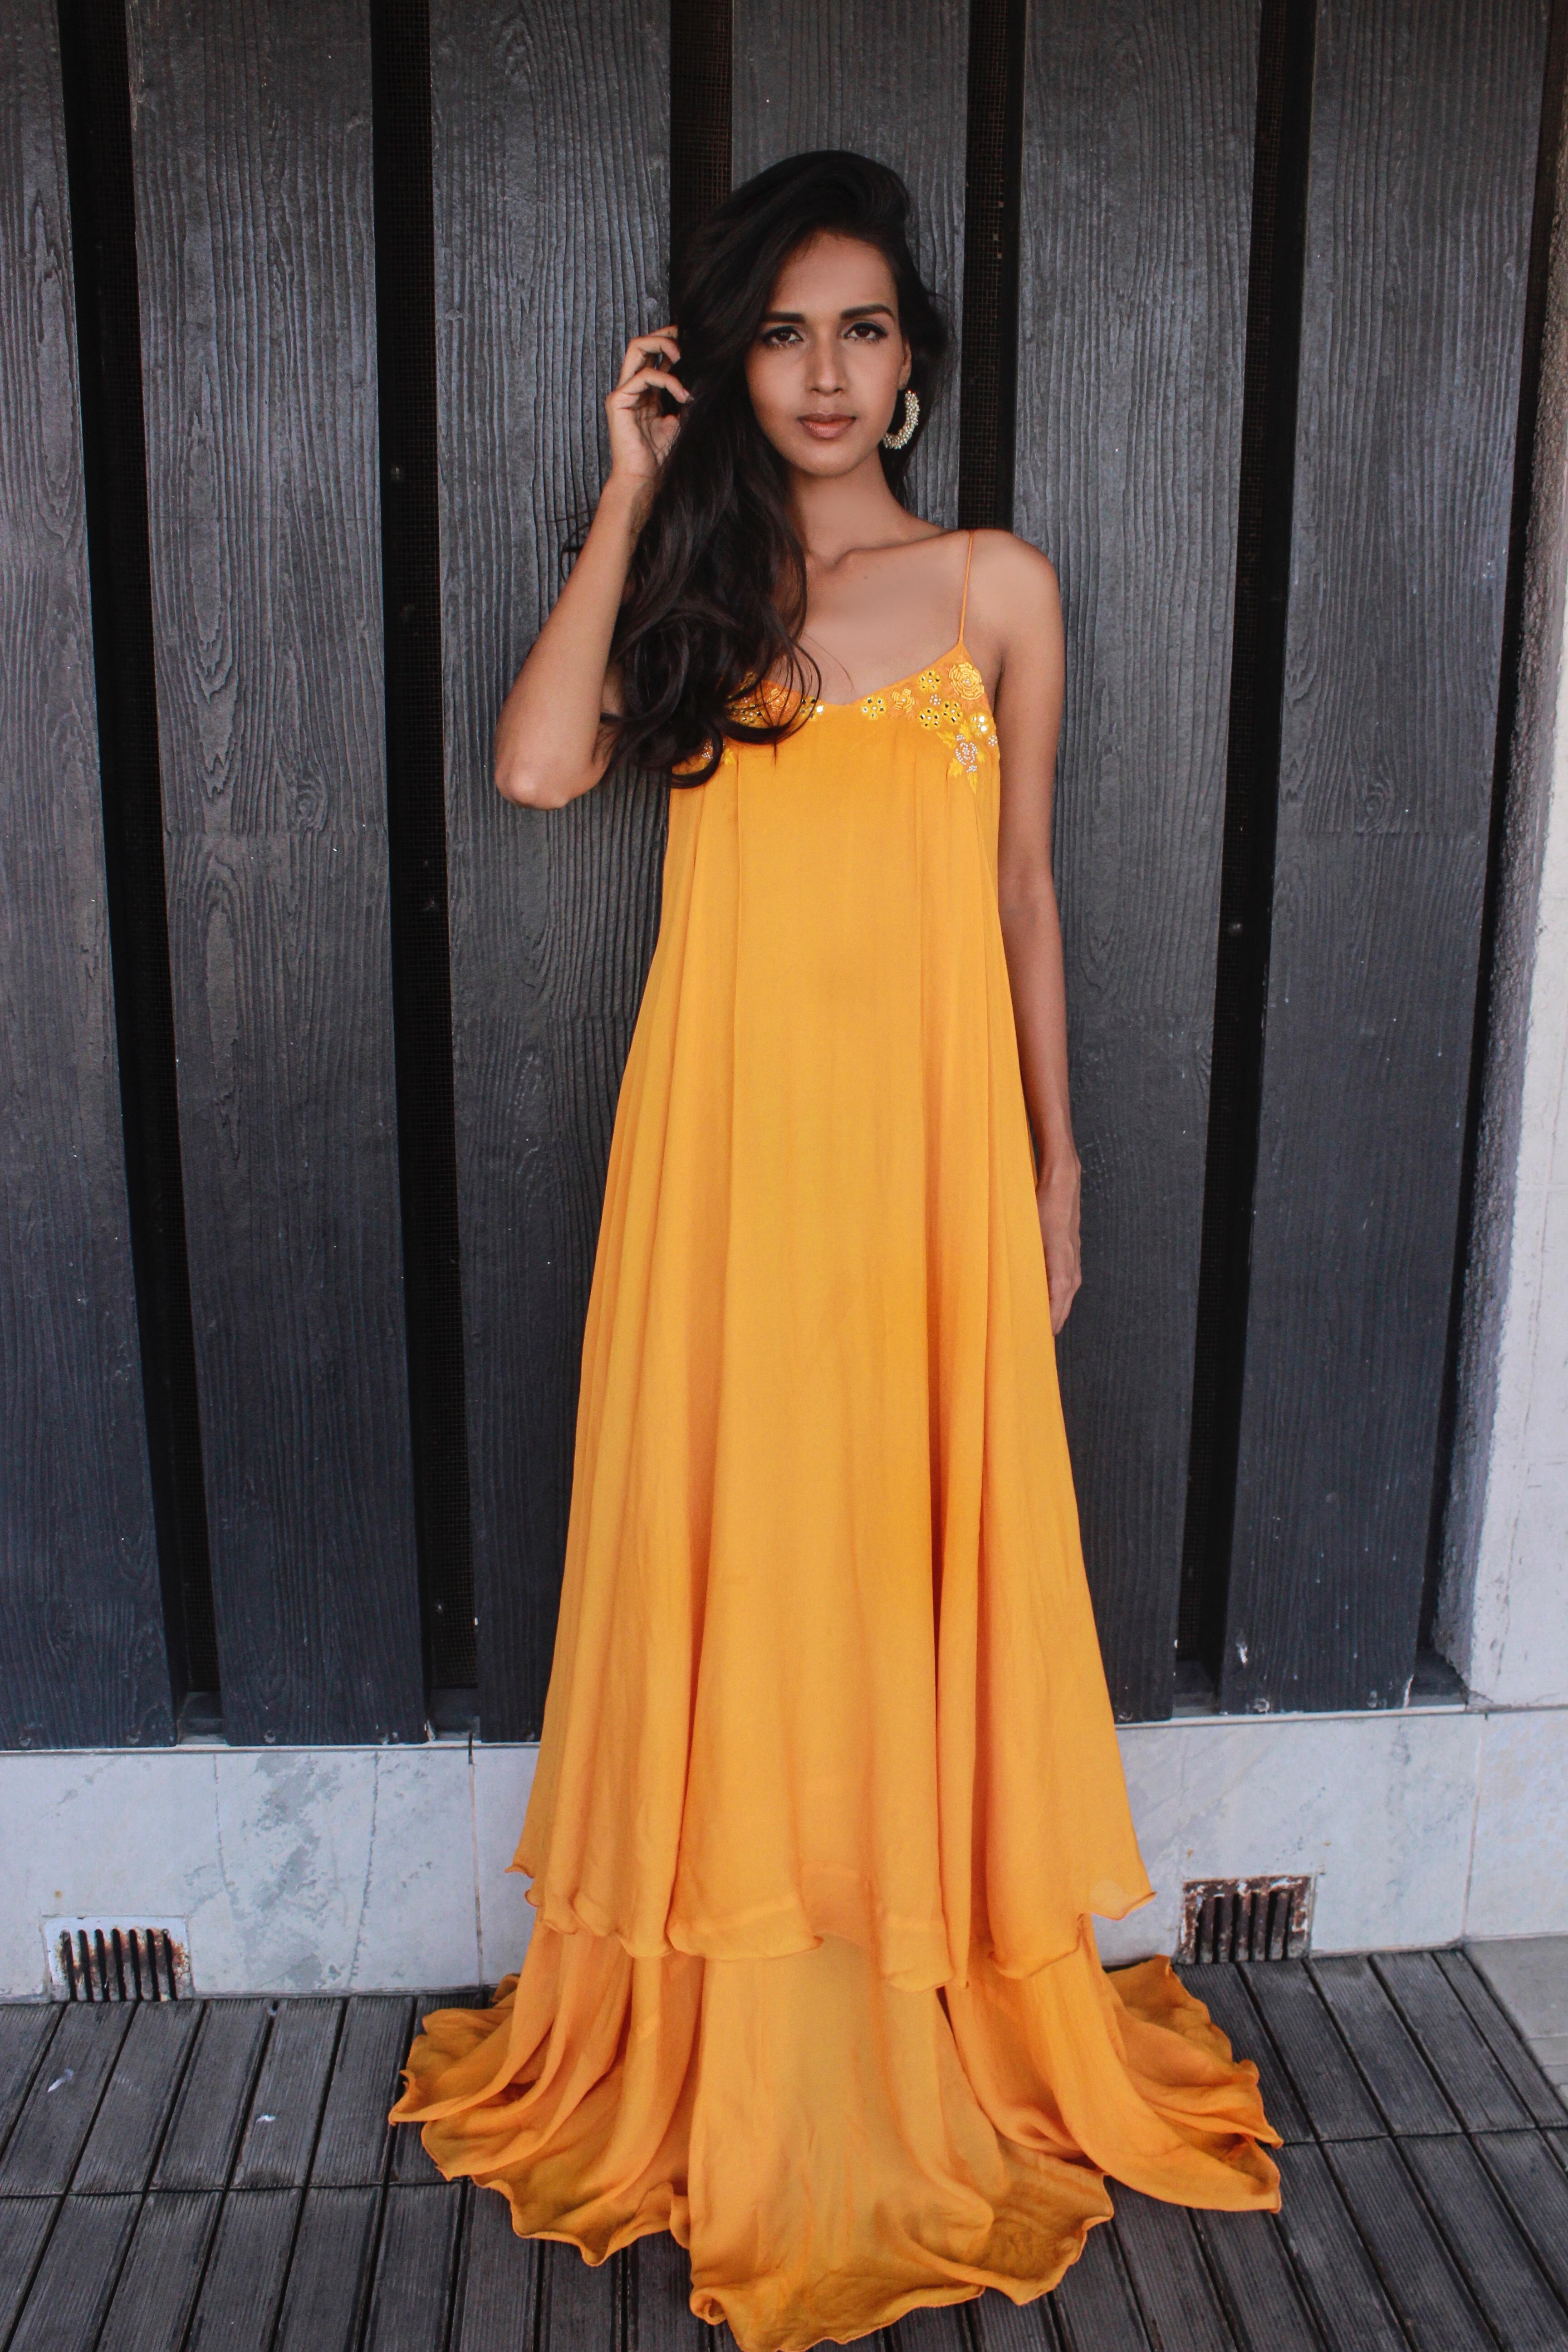 Sunset yellow strappy maxi dress